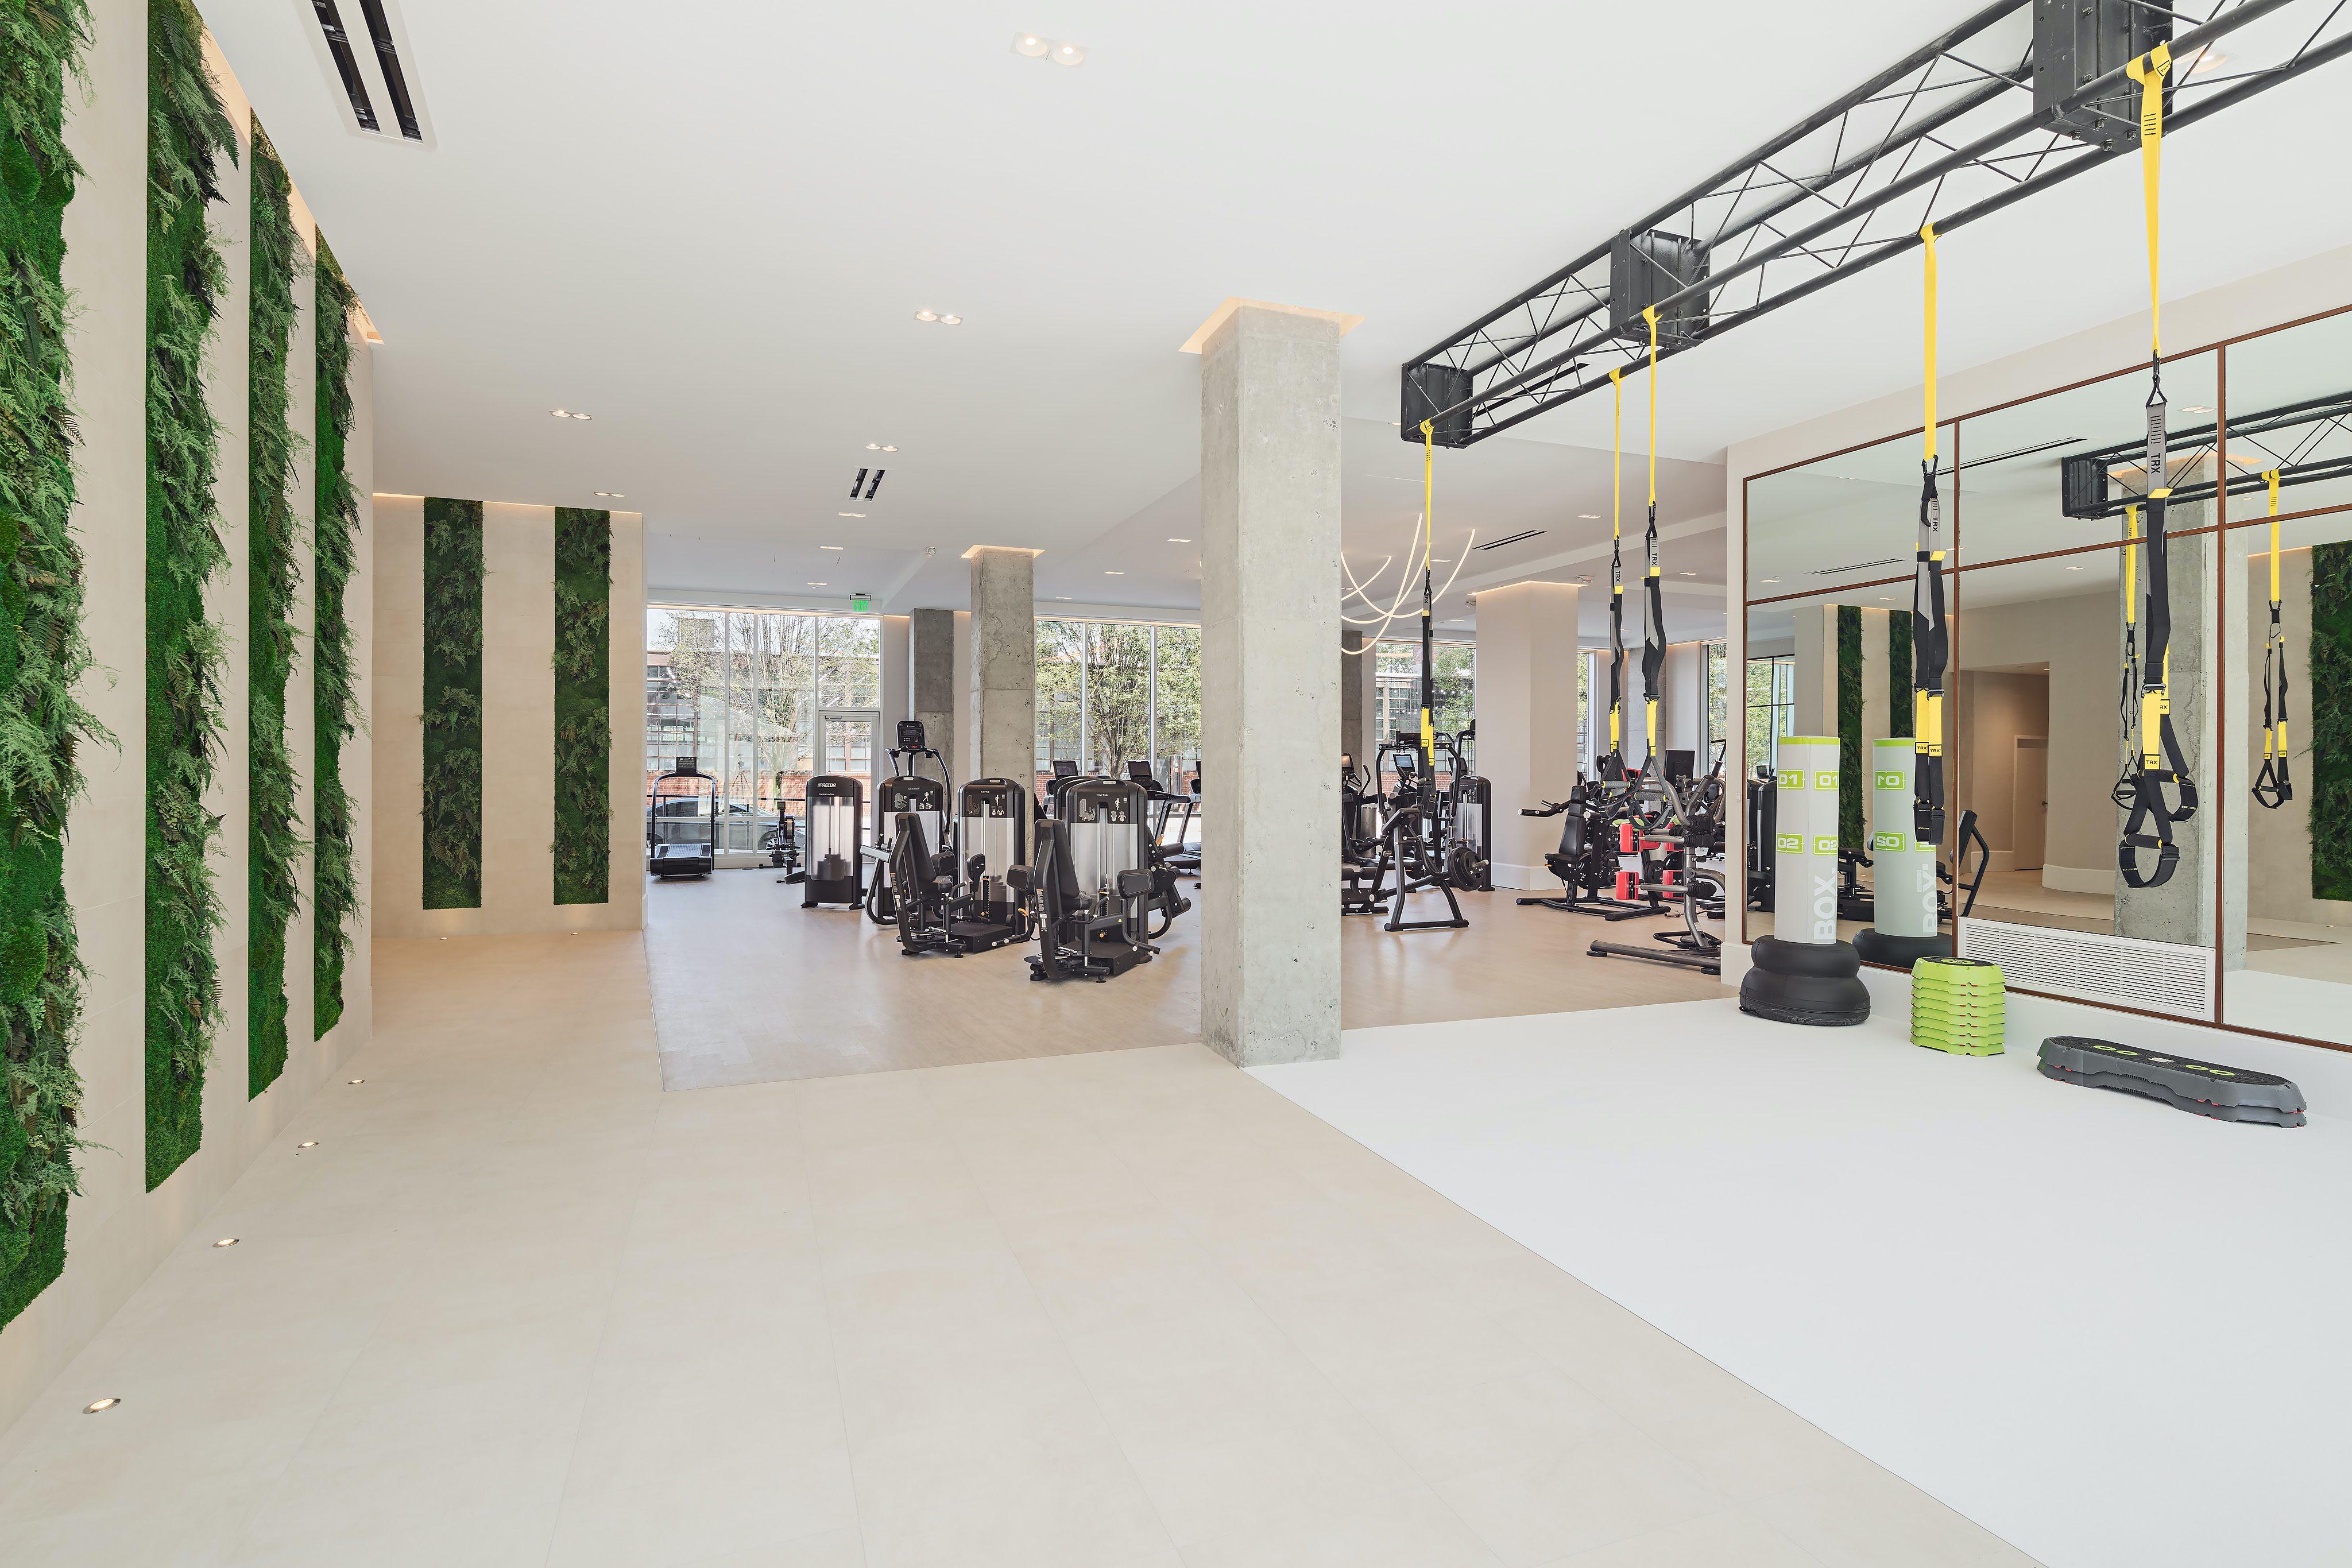 Piazza Cove Fitness Center